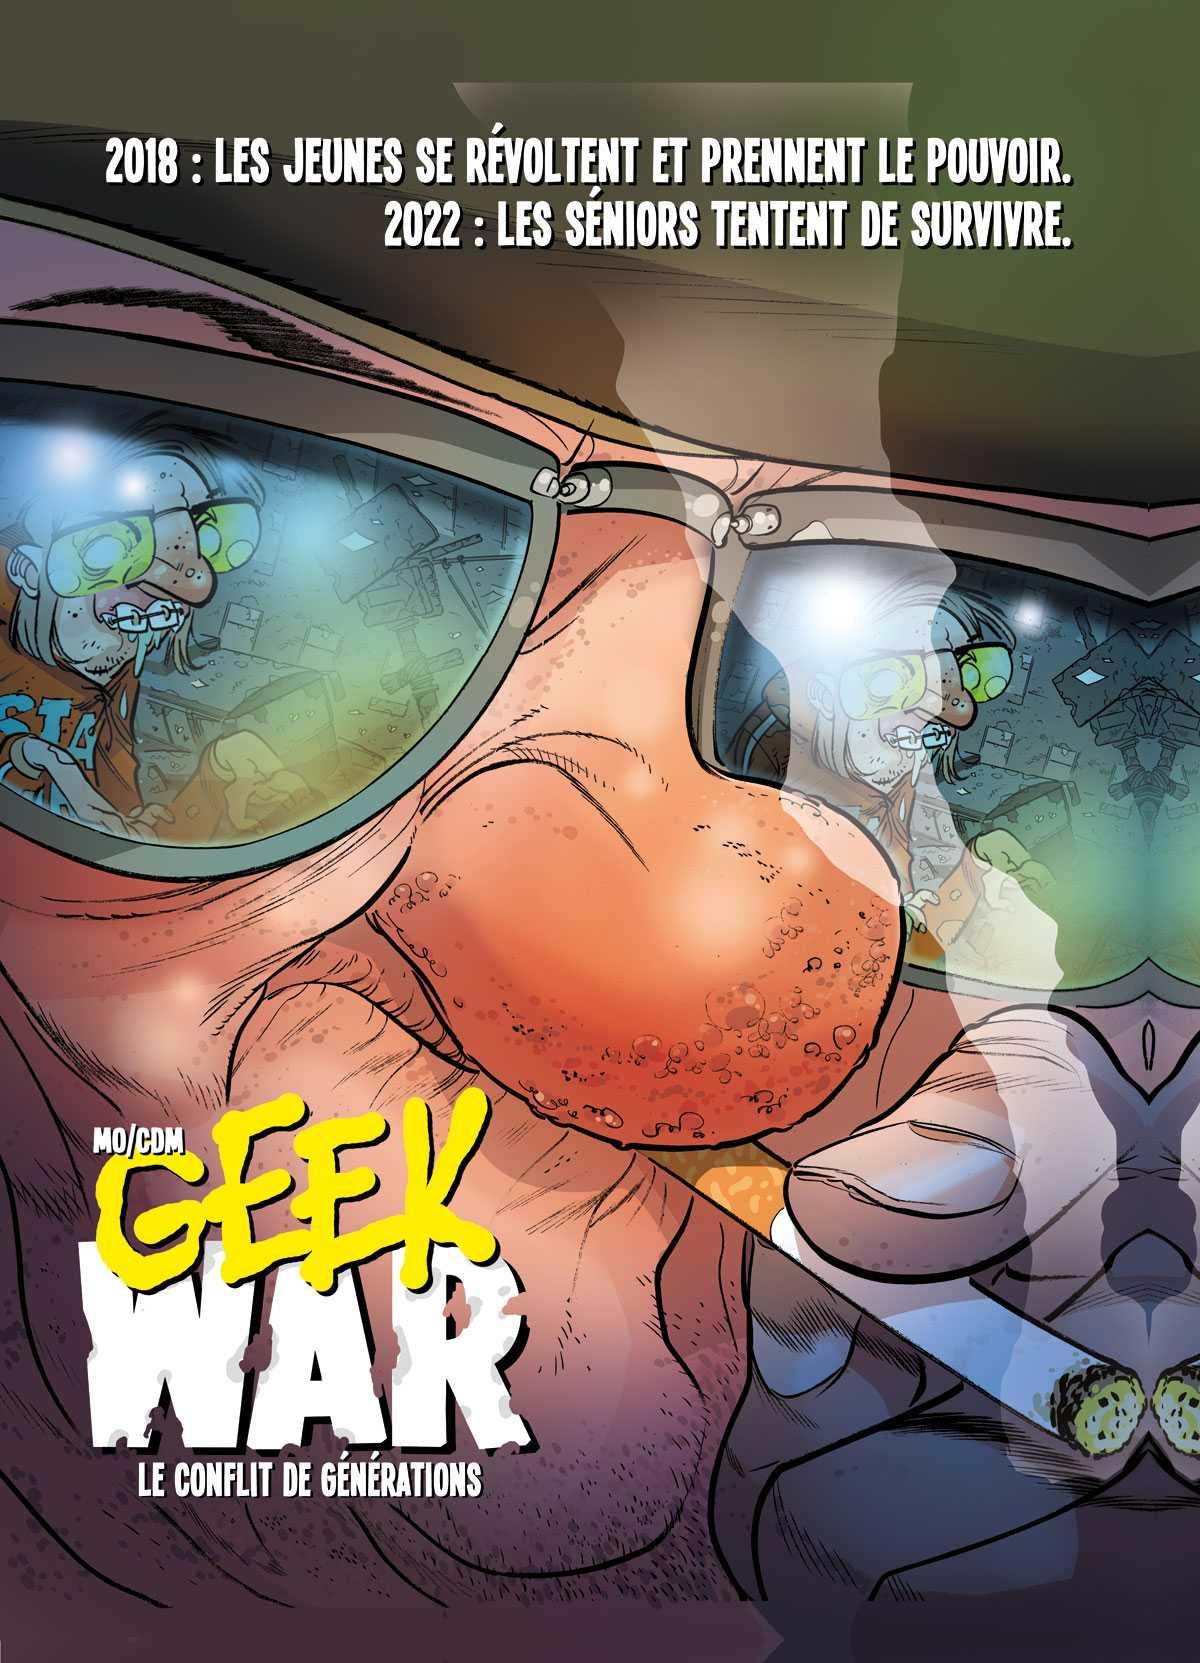 Geek War, les seniors font de la résistance